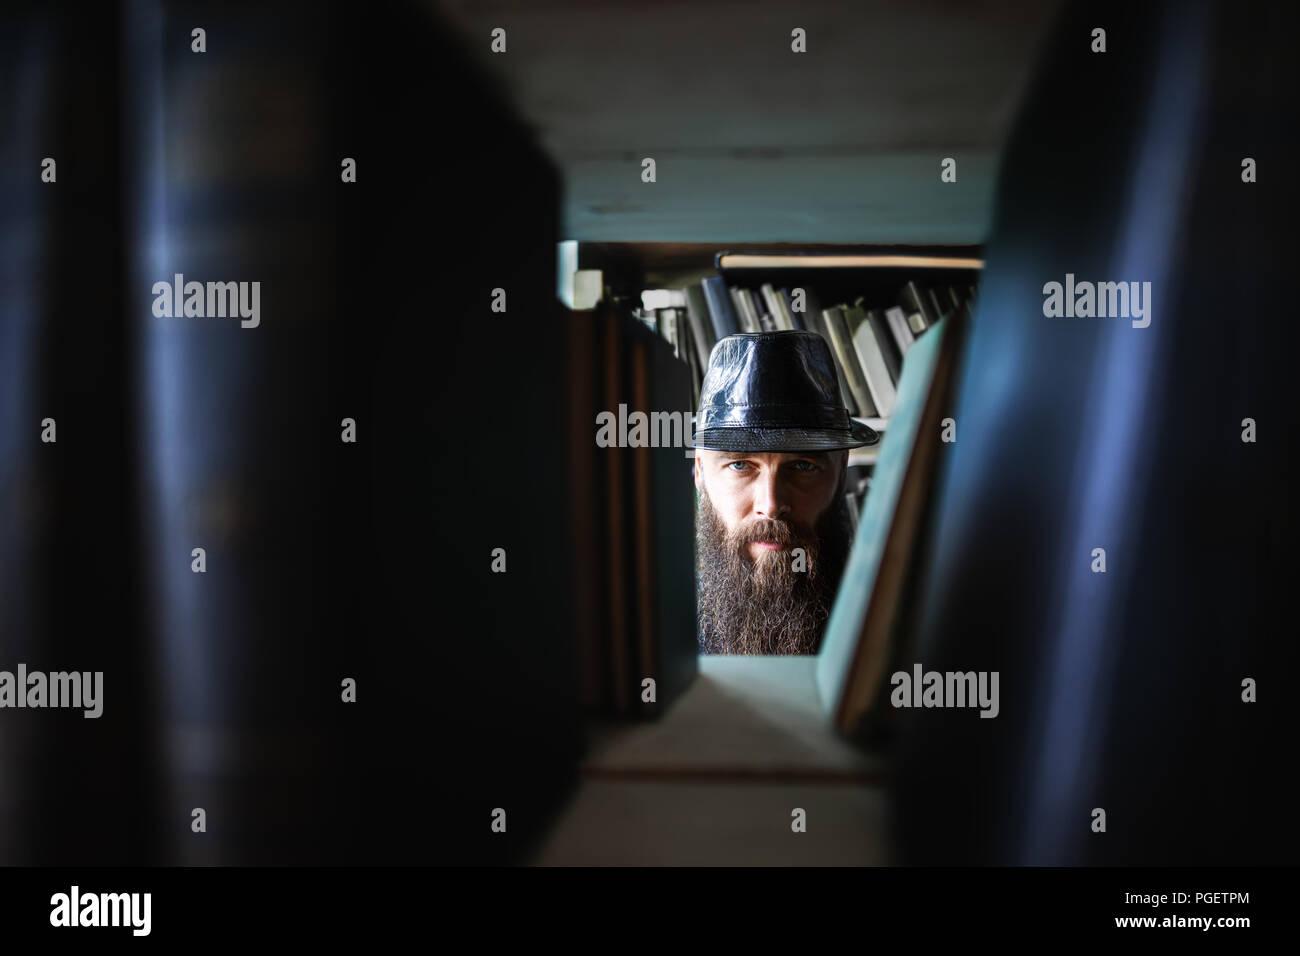 Bearded man spying through bookshelves. mystery сoncept Stock Photo